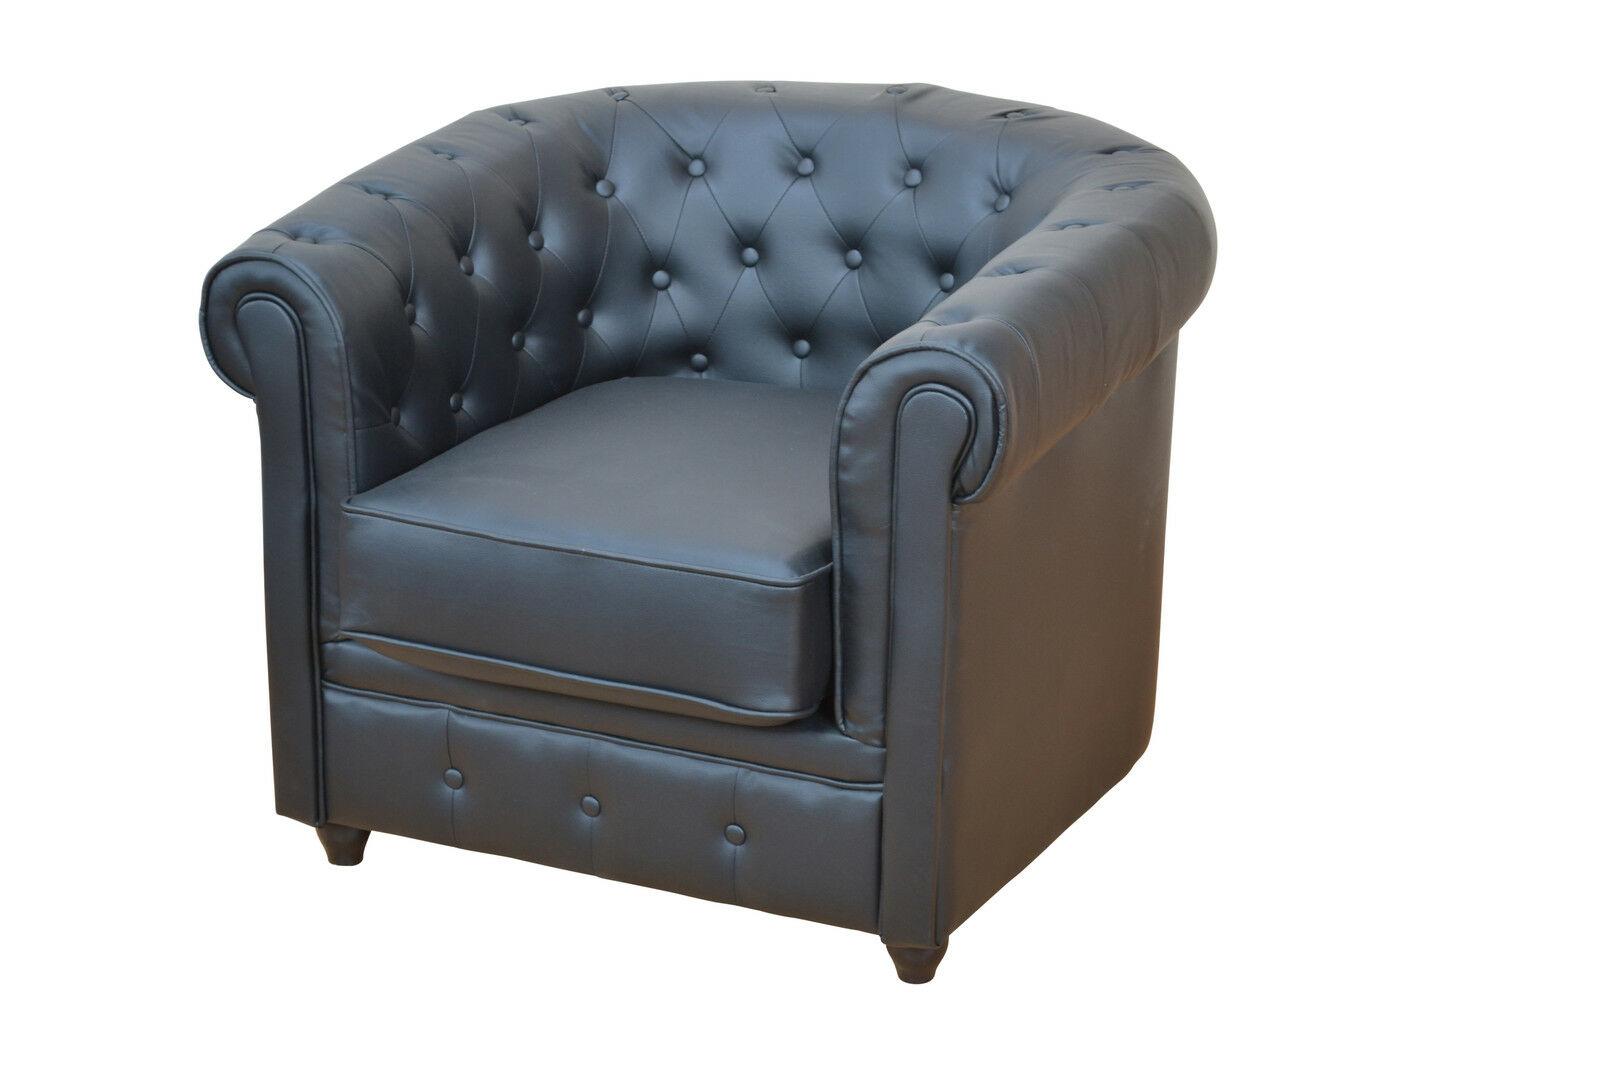 Sessel Schwarz Fernsehsessel Couchsessel Relaxsessel Modern Design